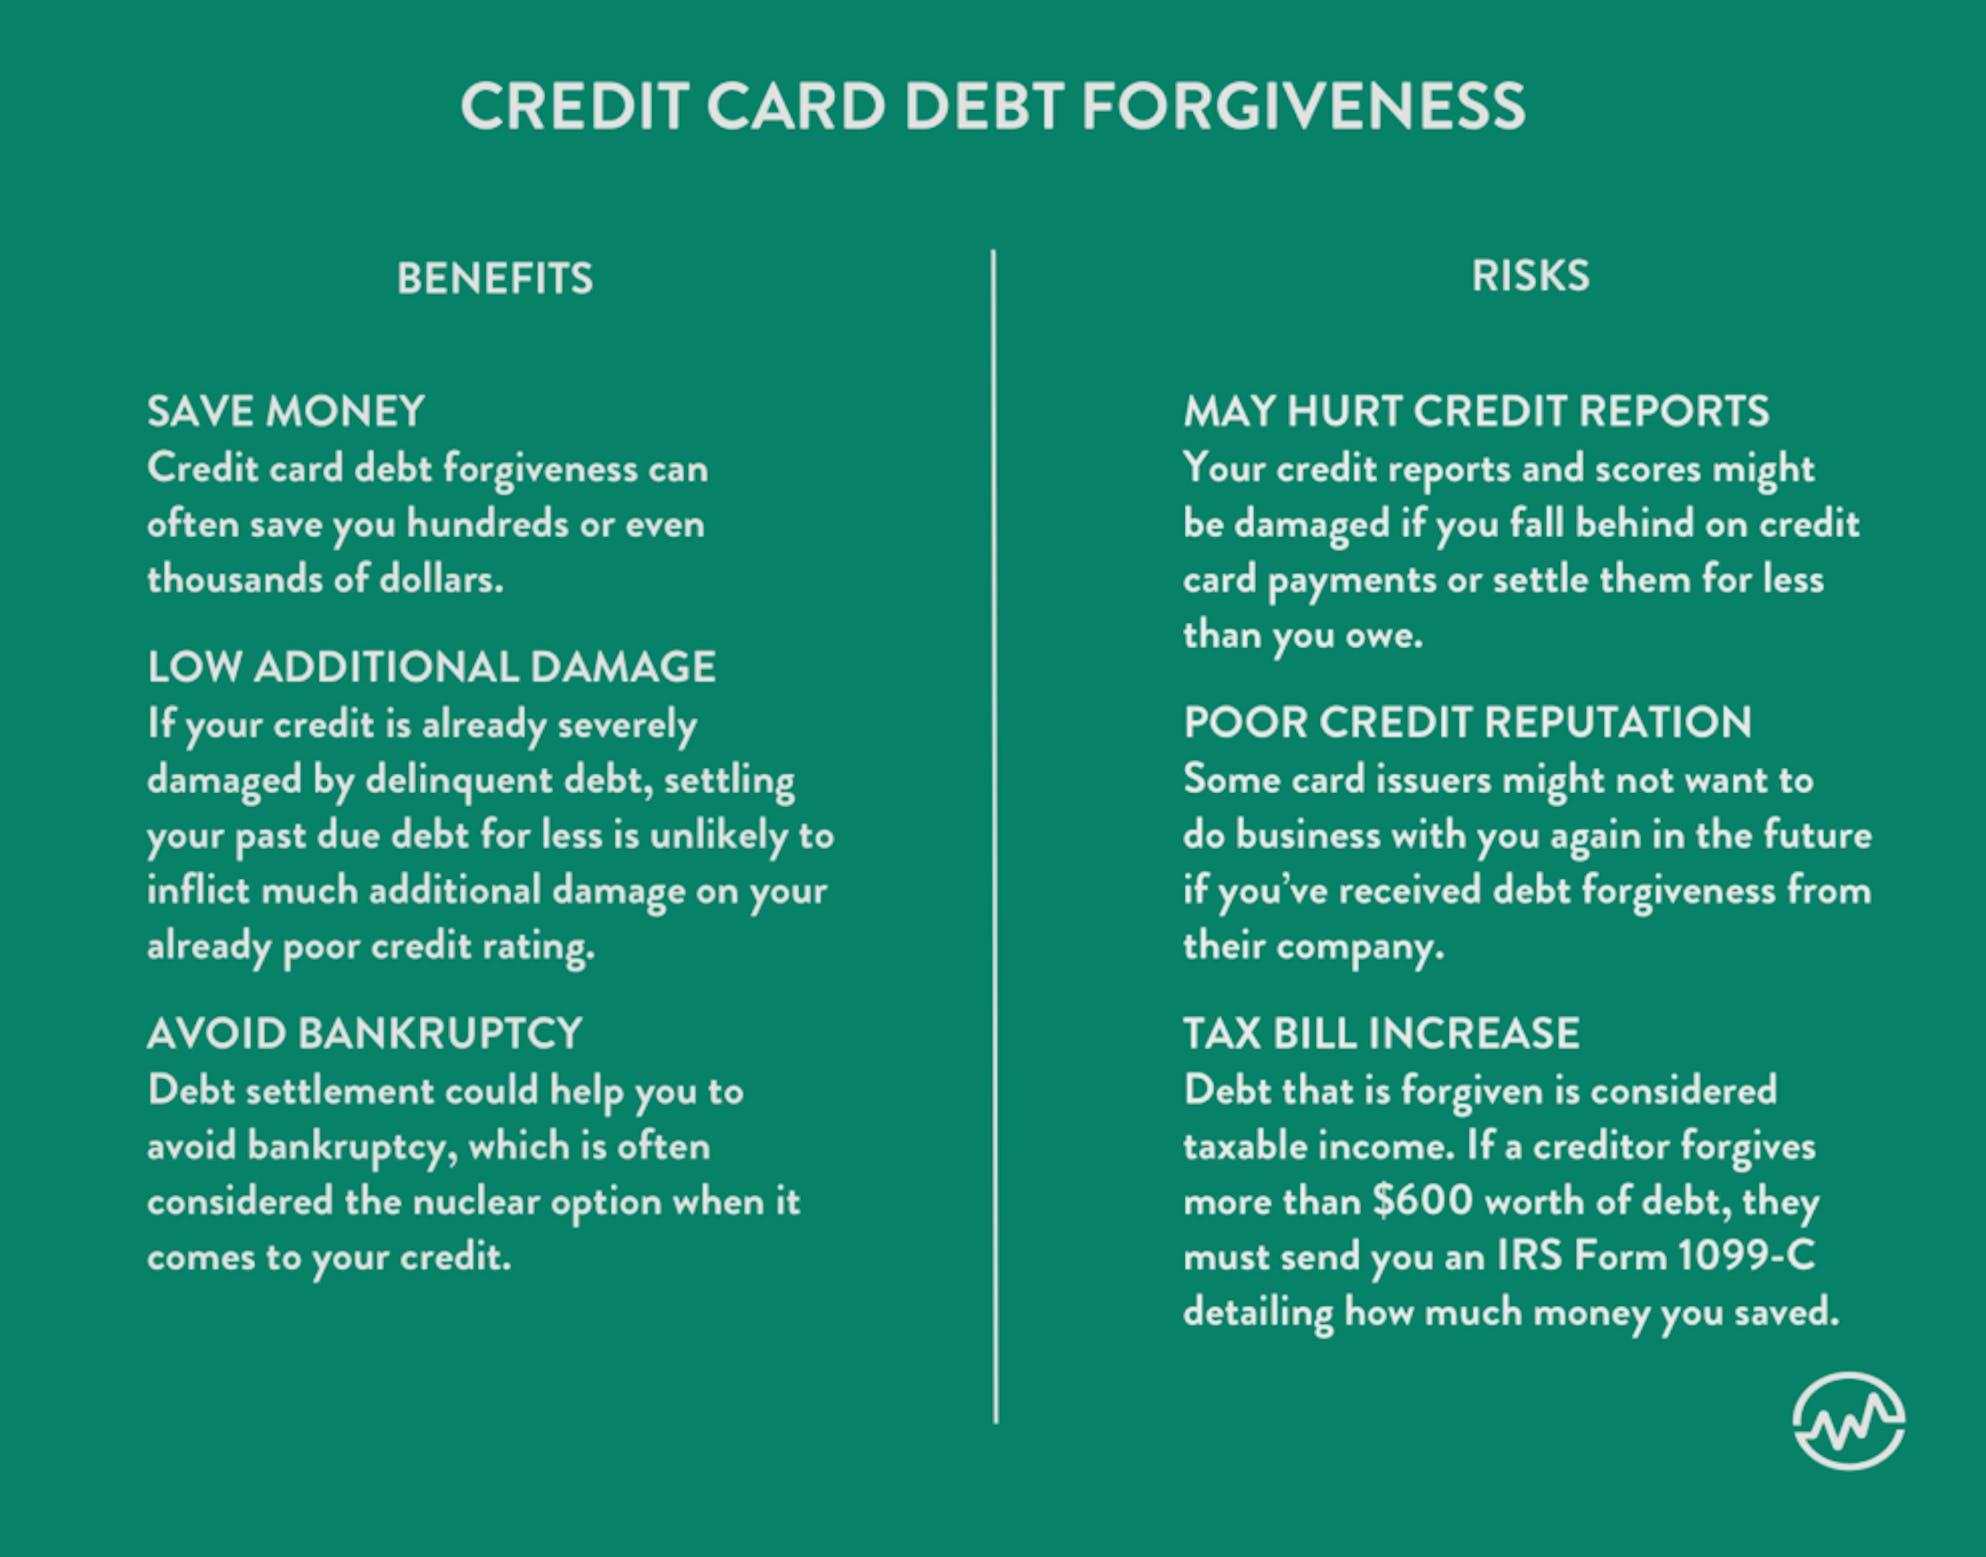 Benefits and risks of credit card debt forgiveness